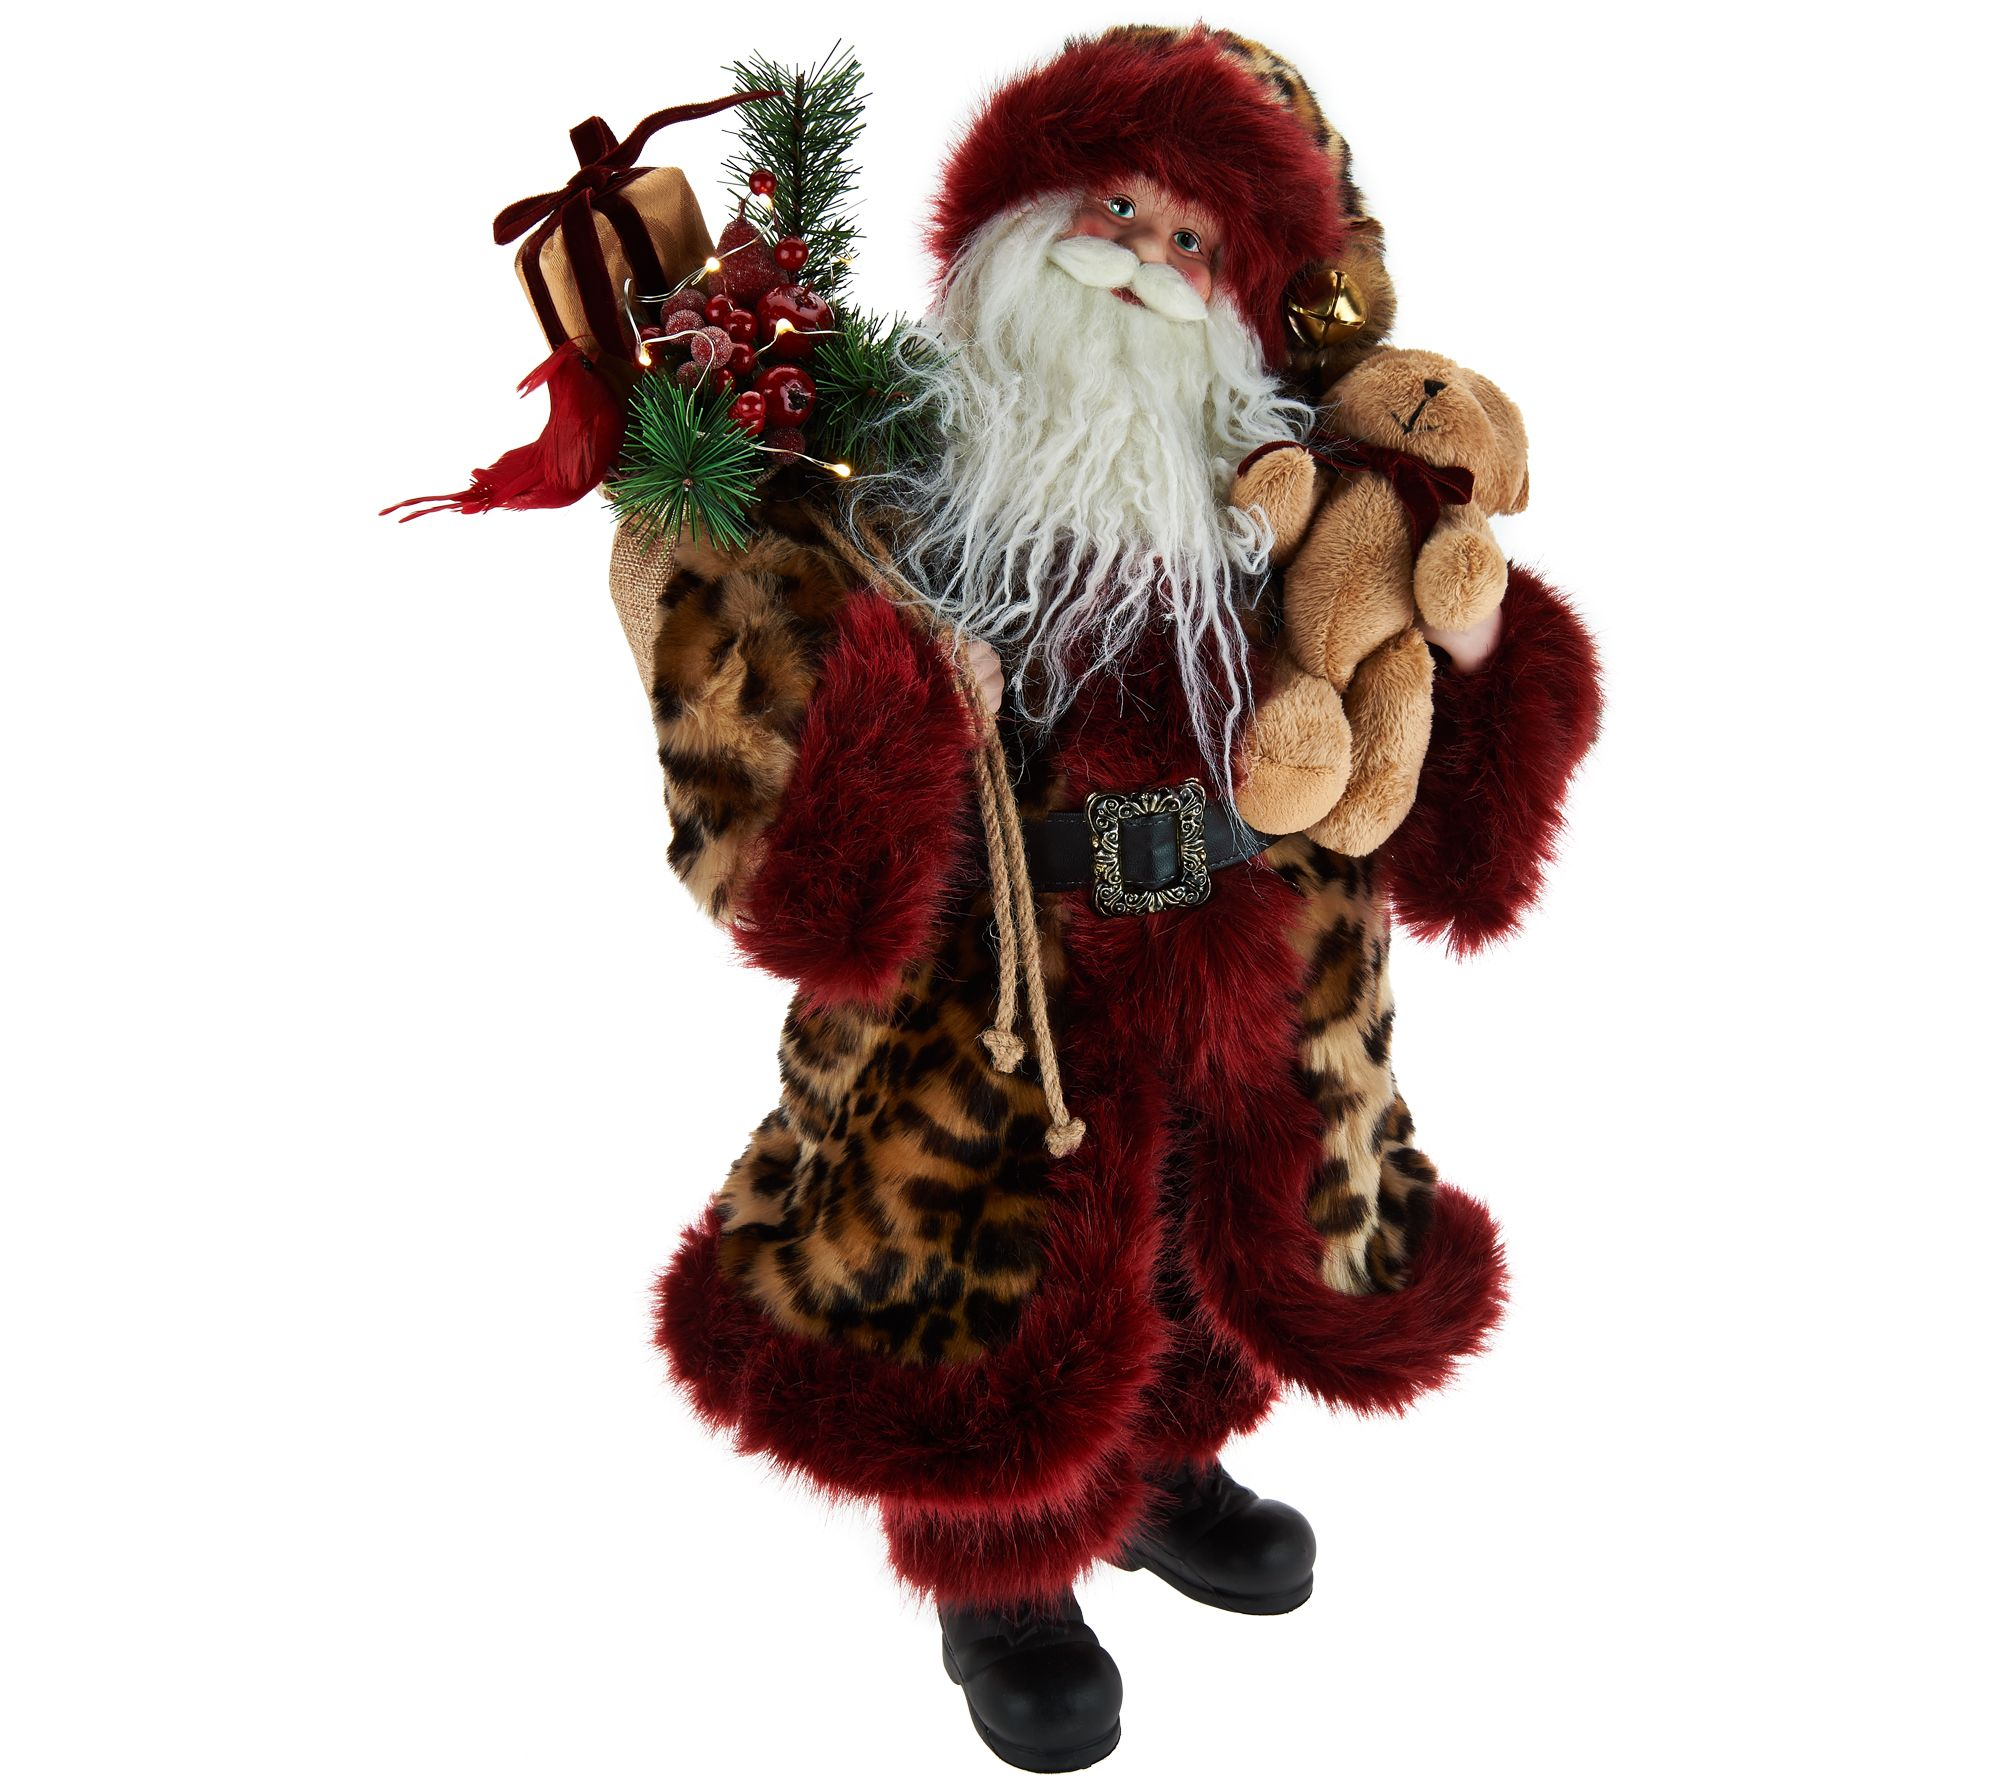 Dennis basso 20 talking santa claus w faux fur trim page 1 - 20 ideen fur gartenmobel ...